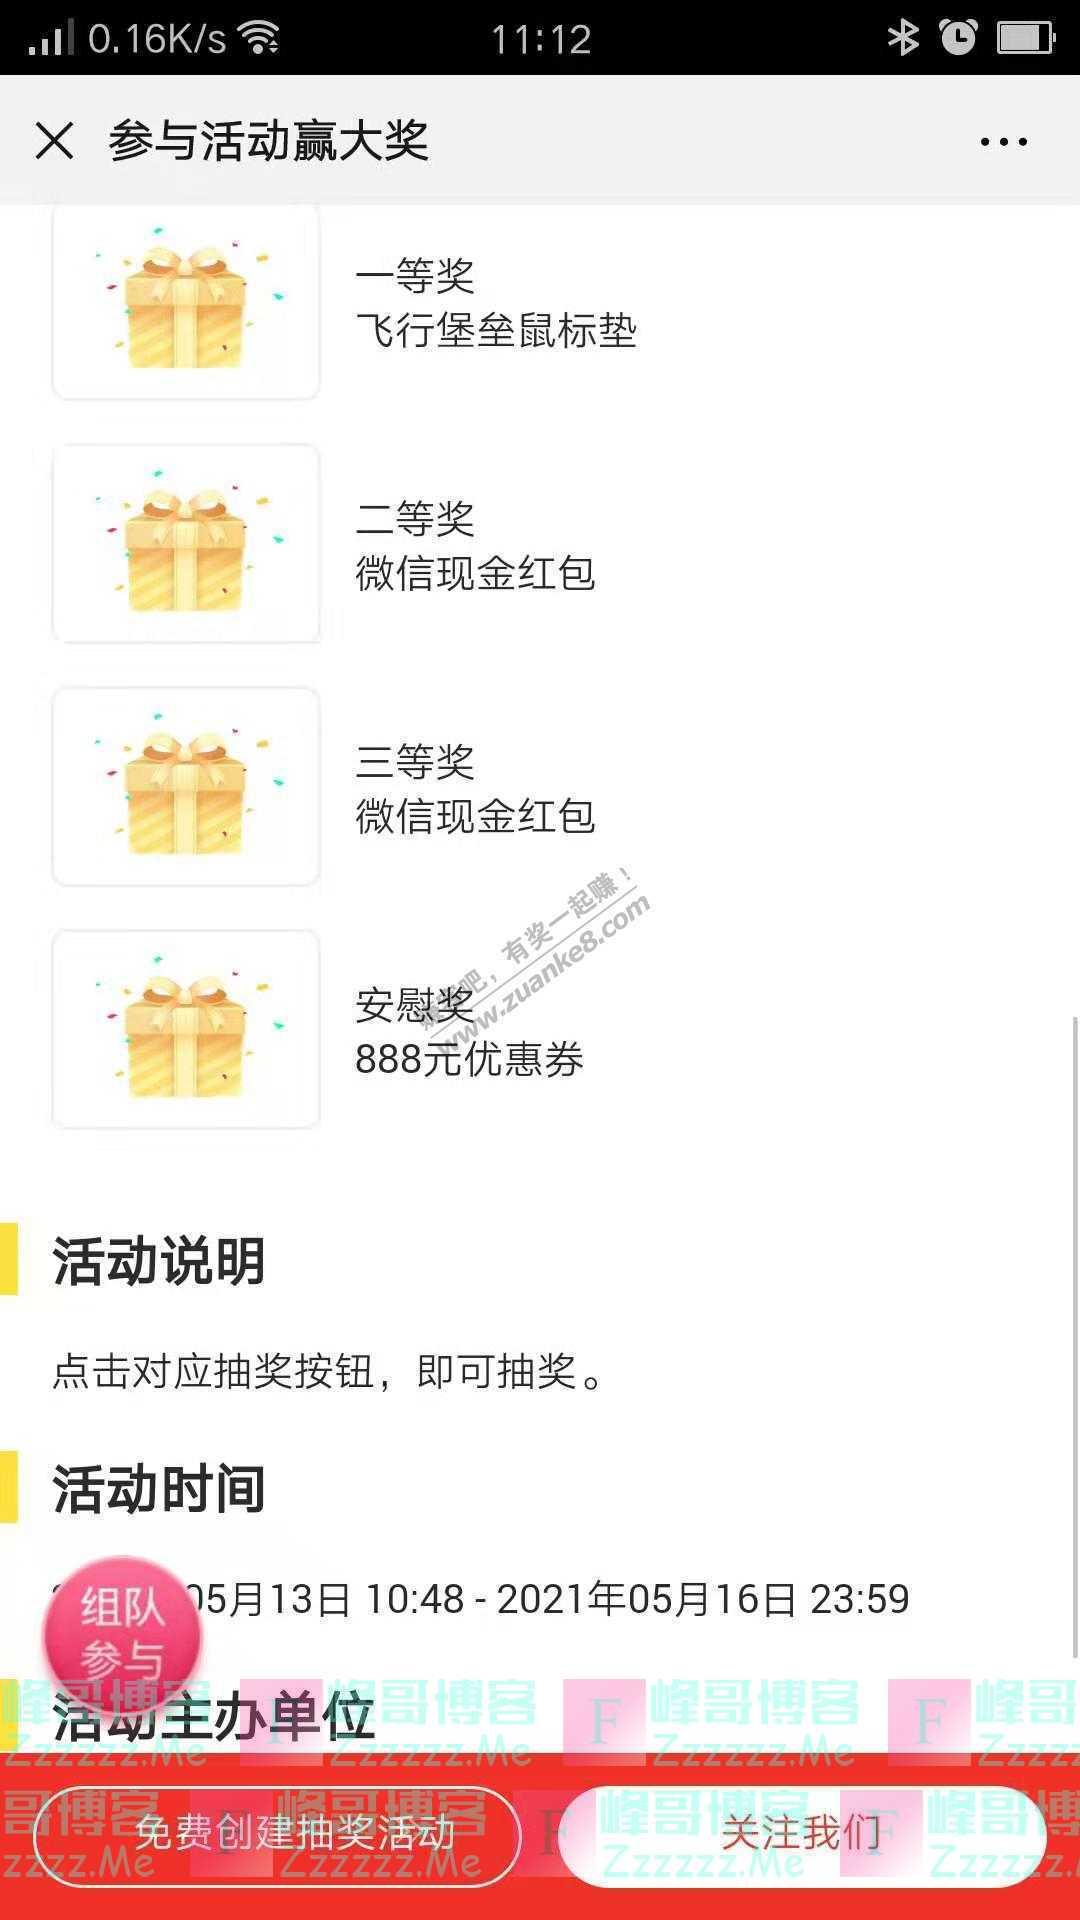 ASUS华硕东北芯如猛虎 幻醒全能 ROG电竞潮品重磅发布(截止5月16日)